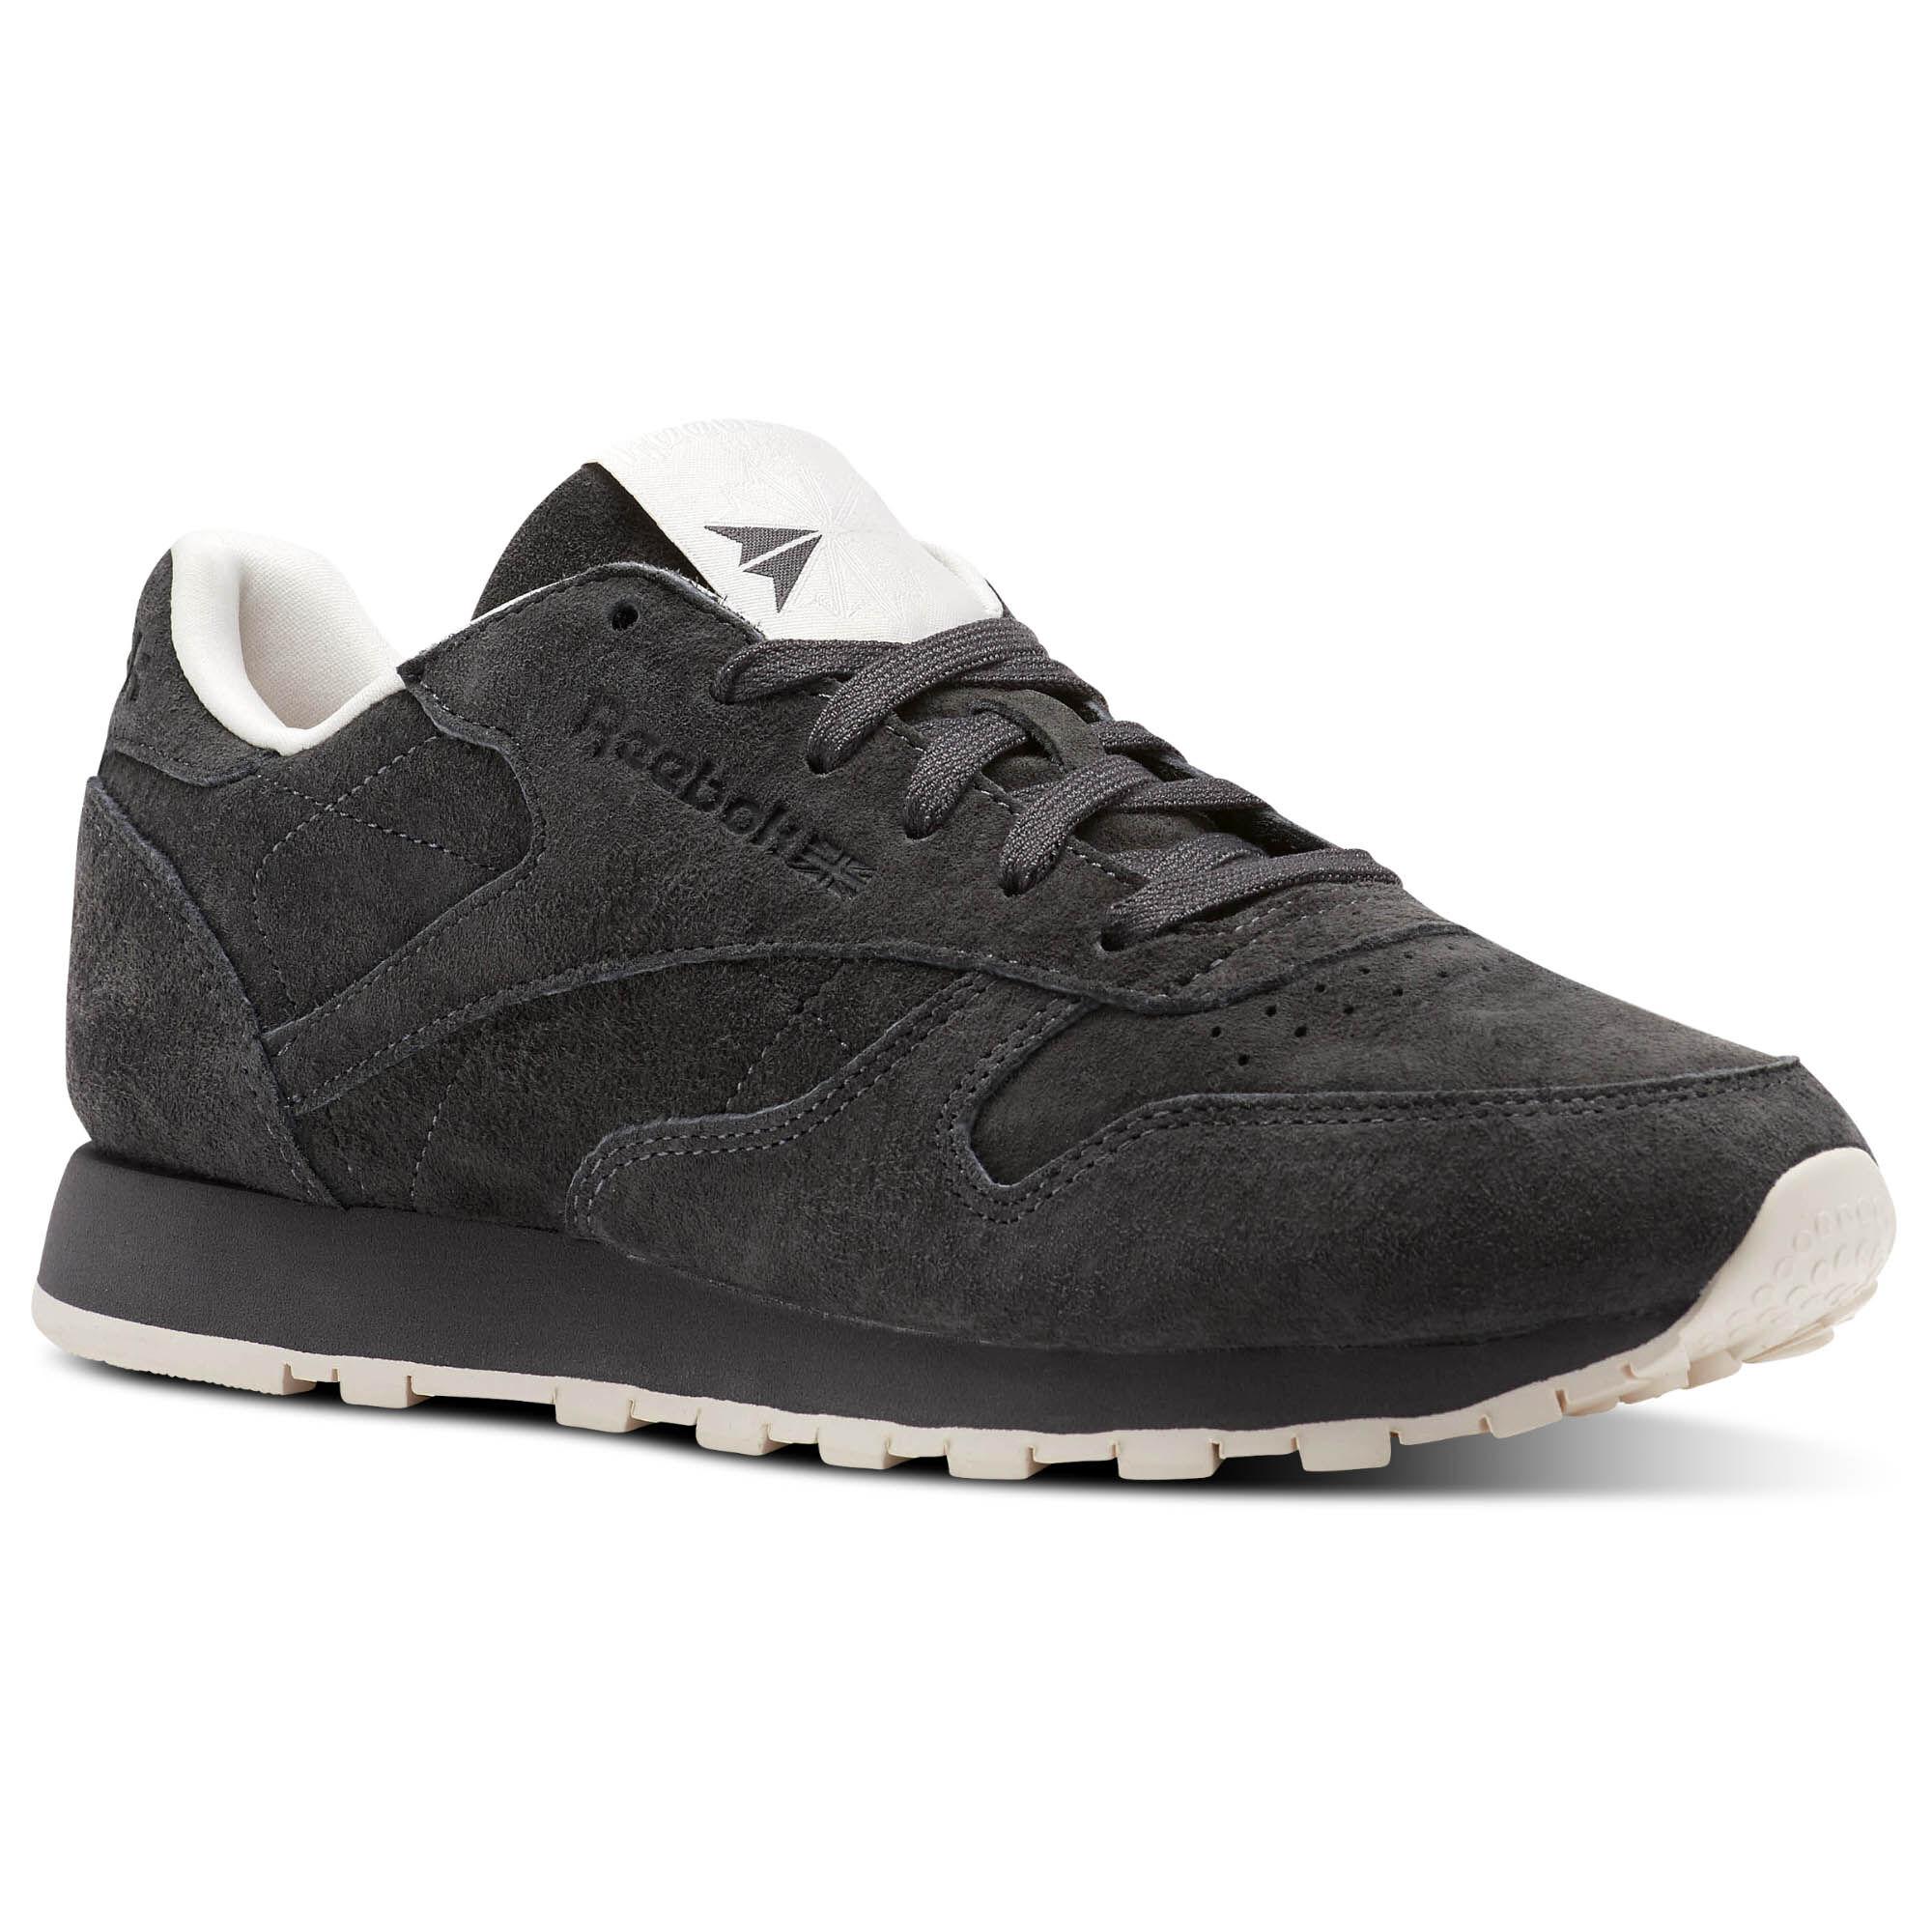 Womens Classic Leather Tonal NBK Low-Top Sneakers, Grey Reebok